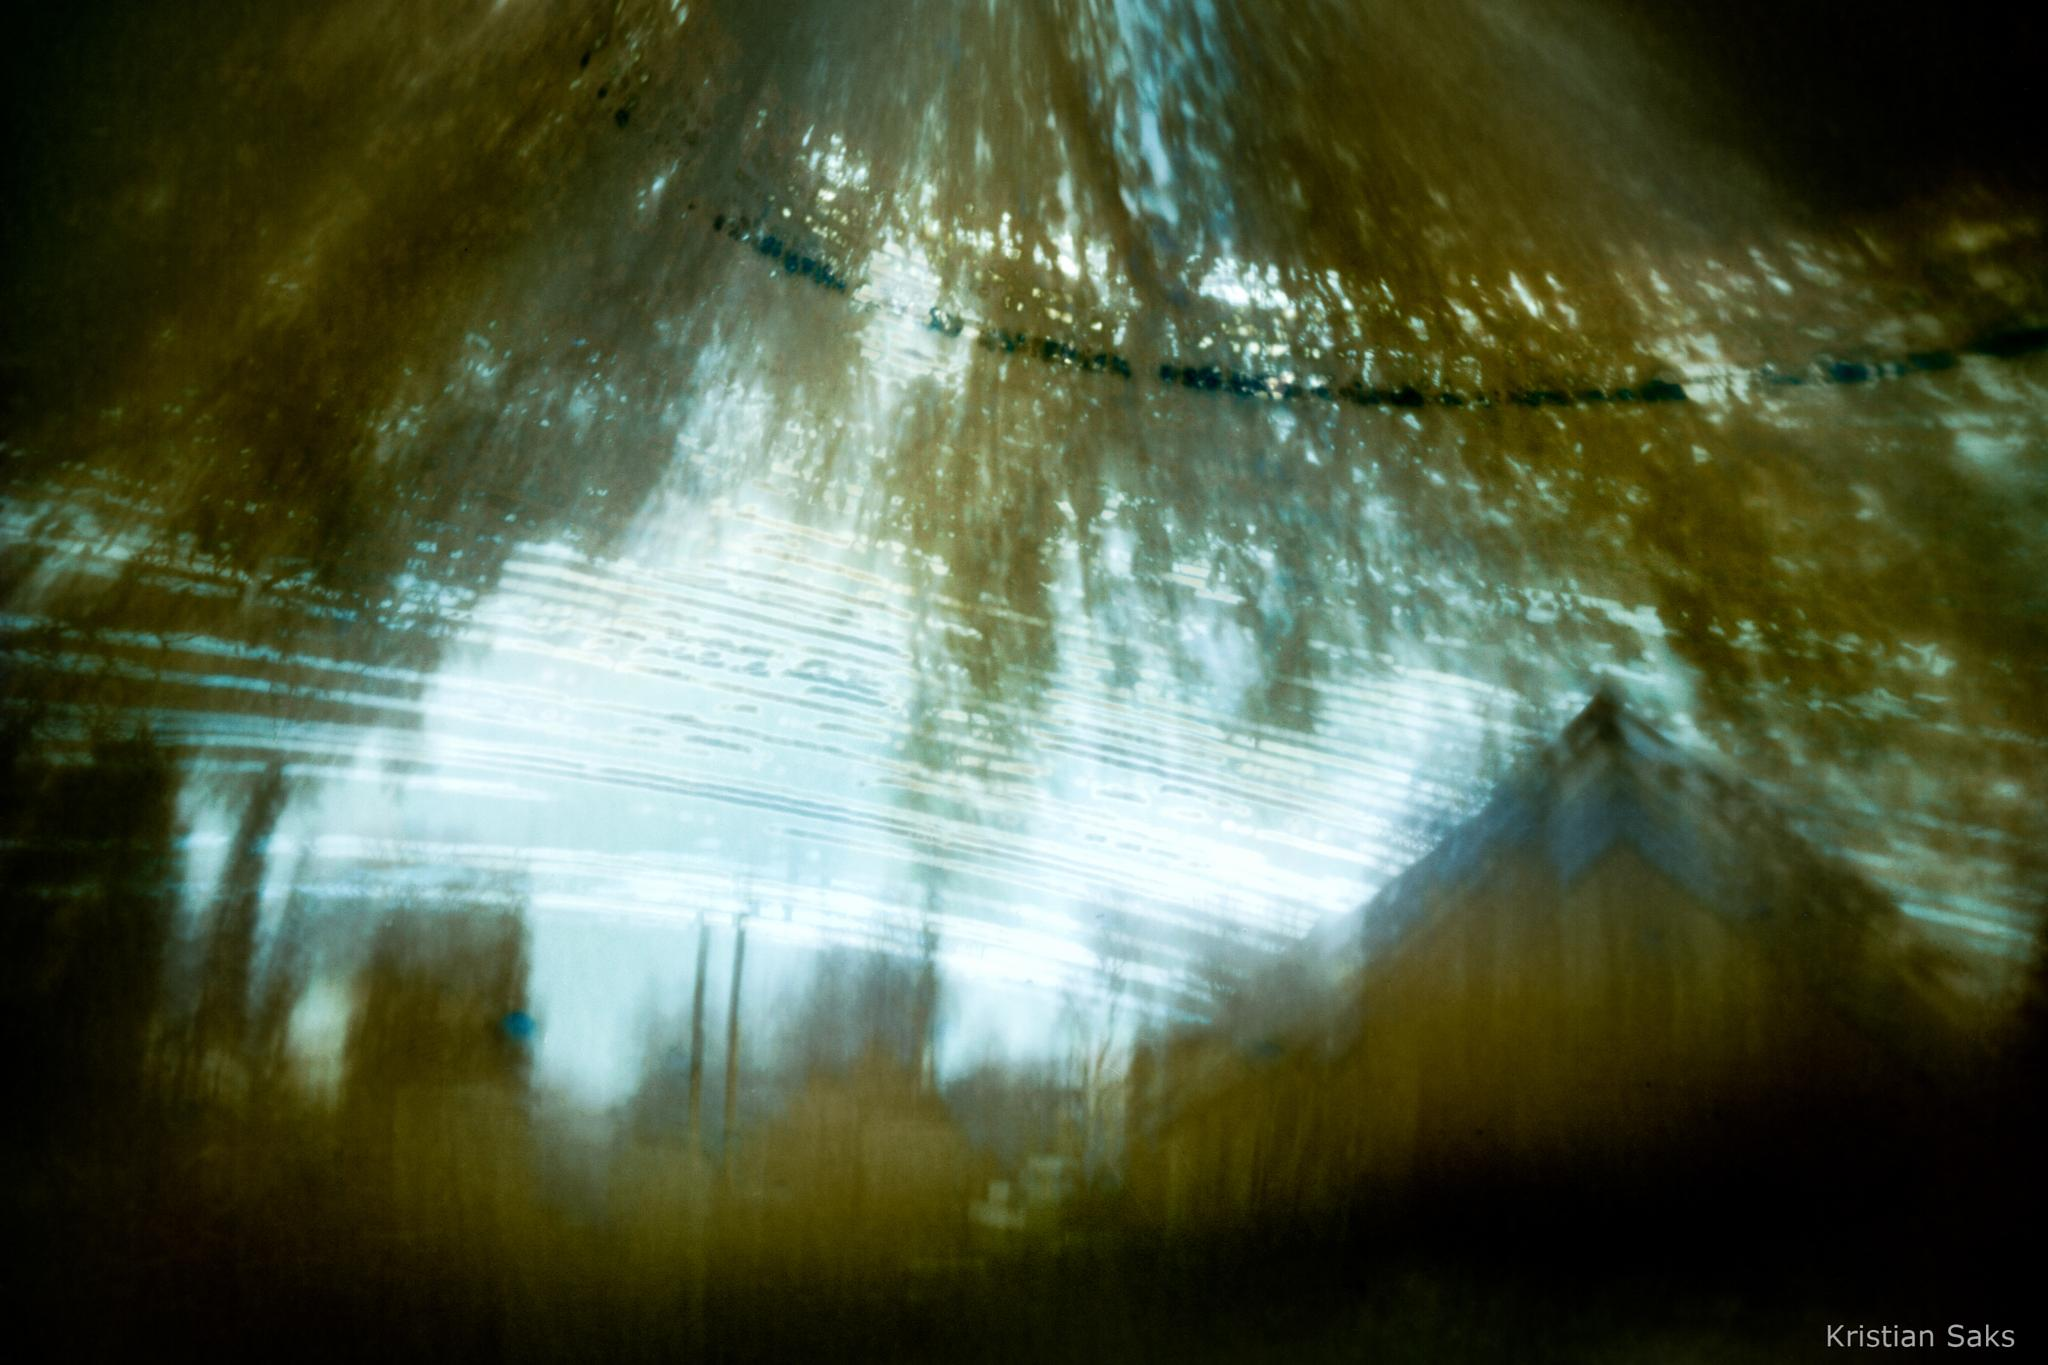 Silhouette by Kristian Saks